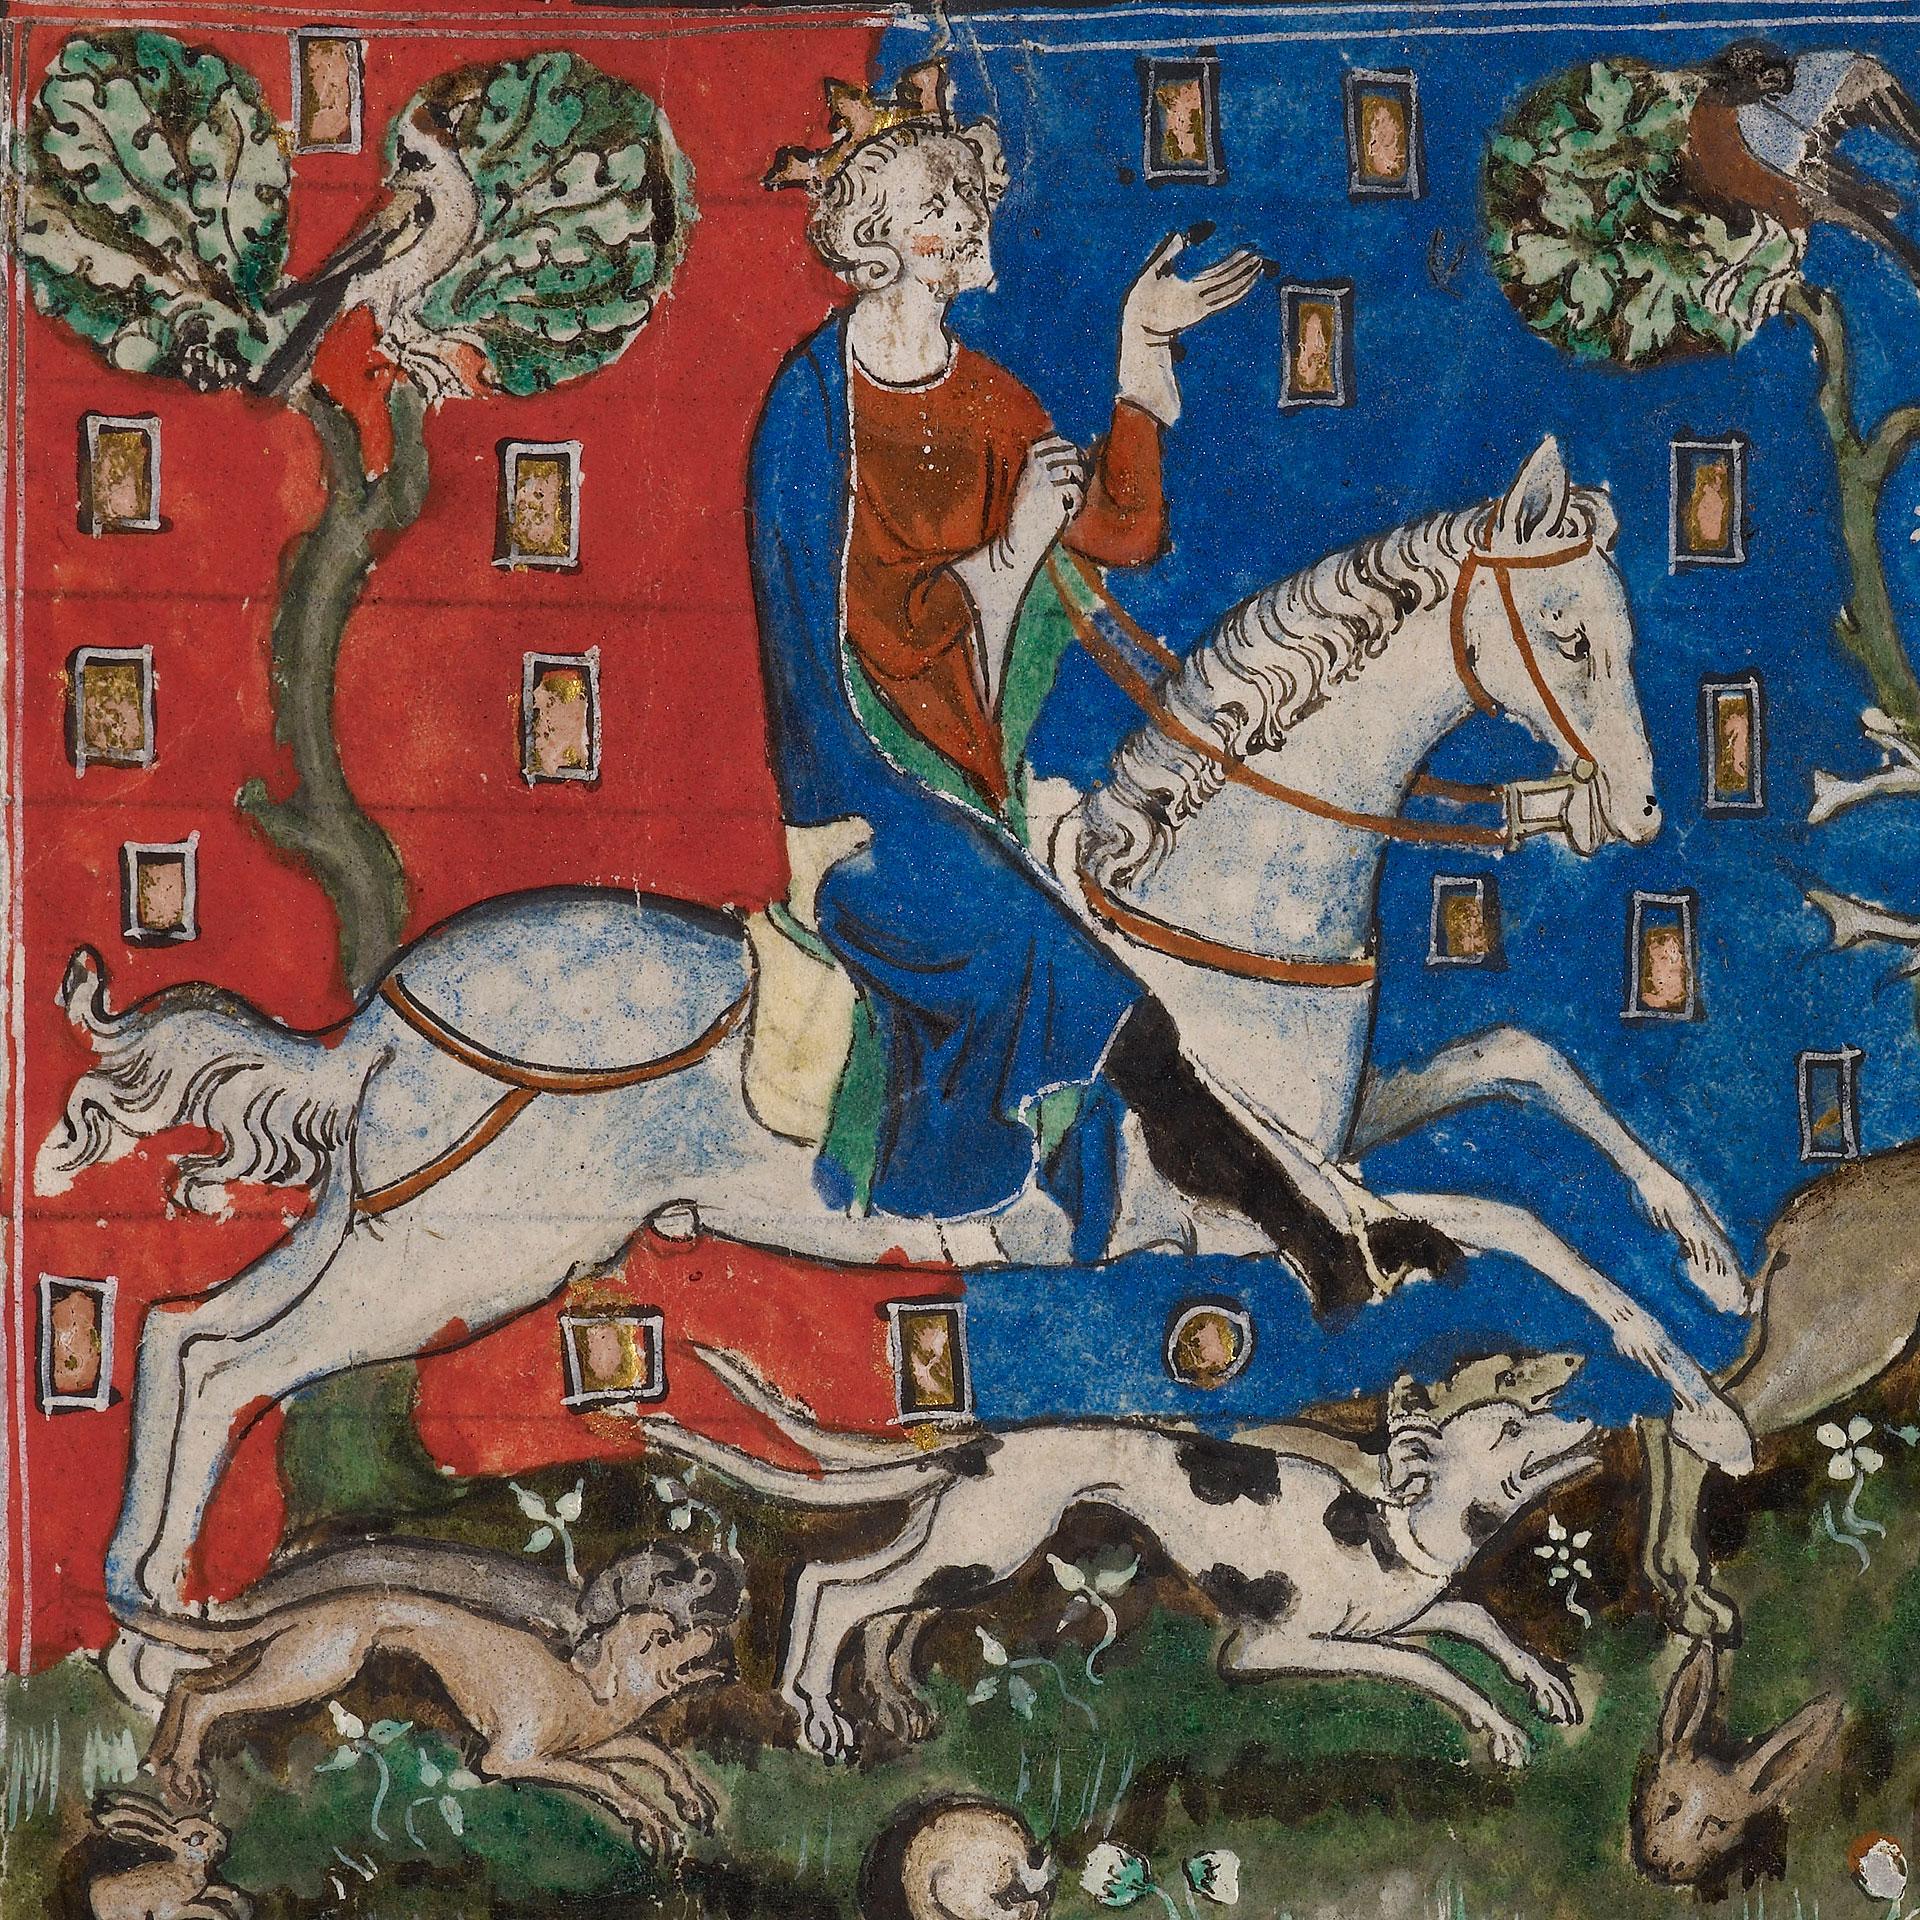 Origins of Magna Carta